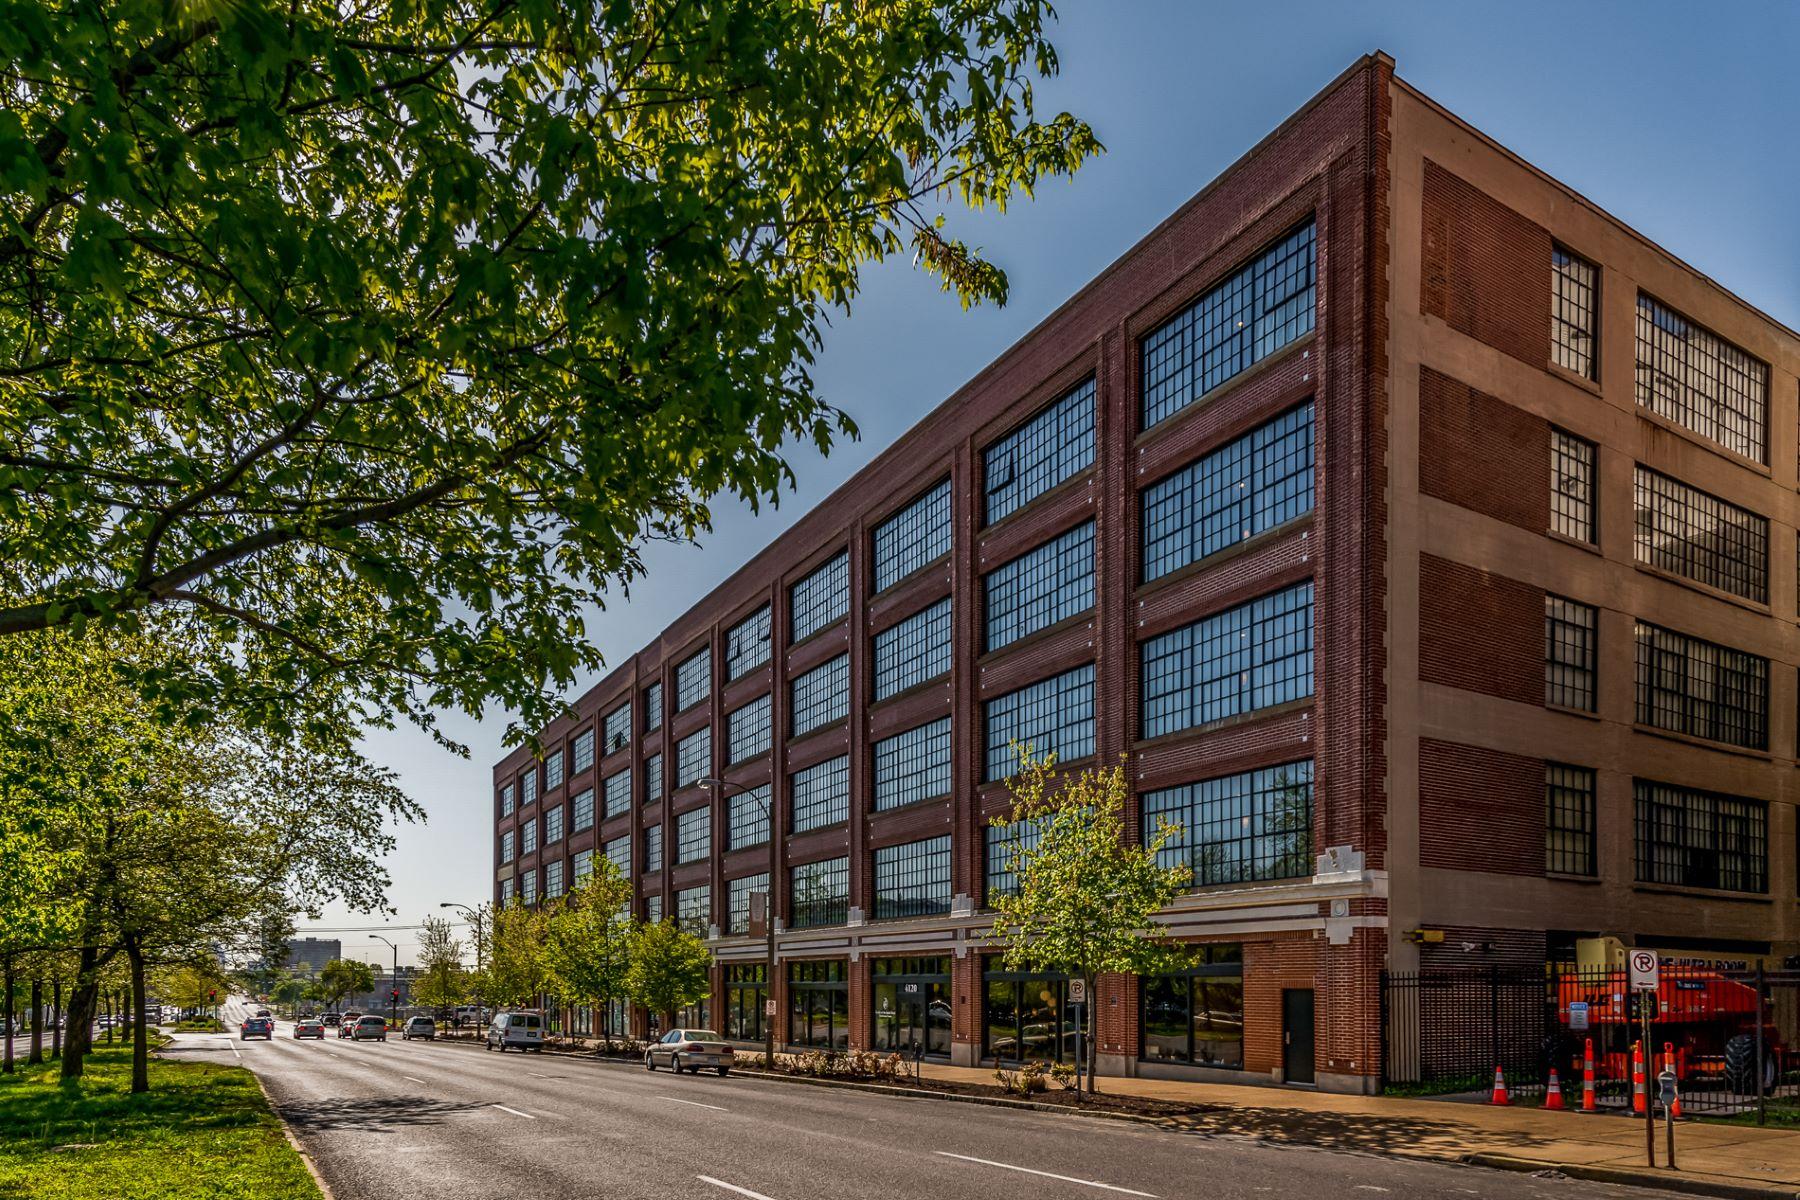 Property for Sale at West End Lofts #323 4100 Forest Park Avenue #323 St. Louis, Missouri 63108 United States